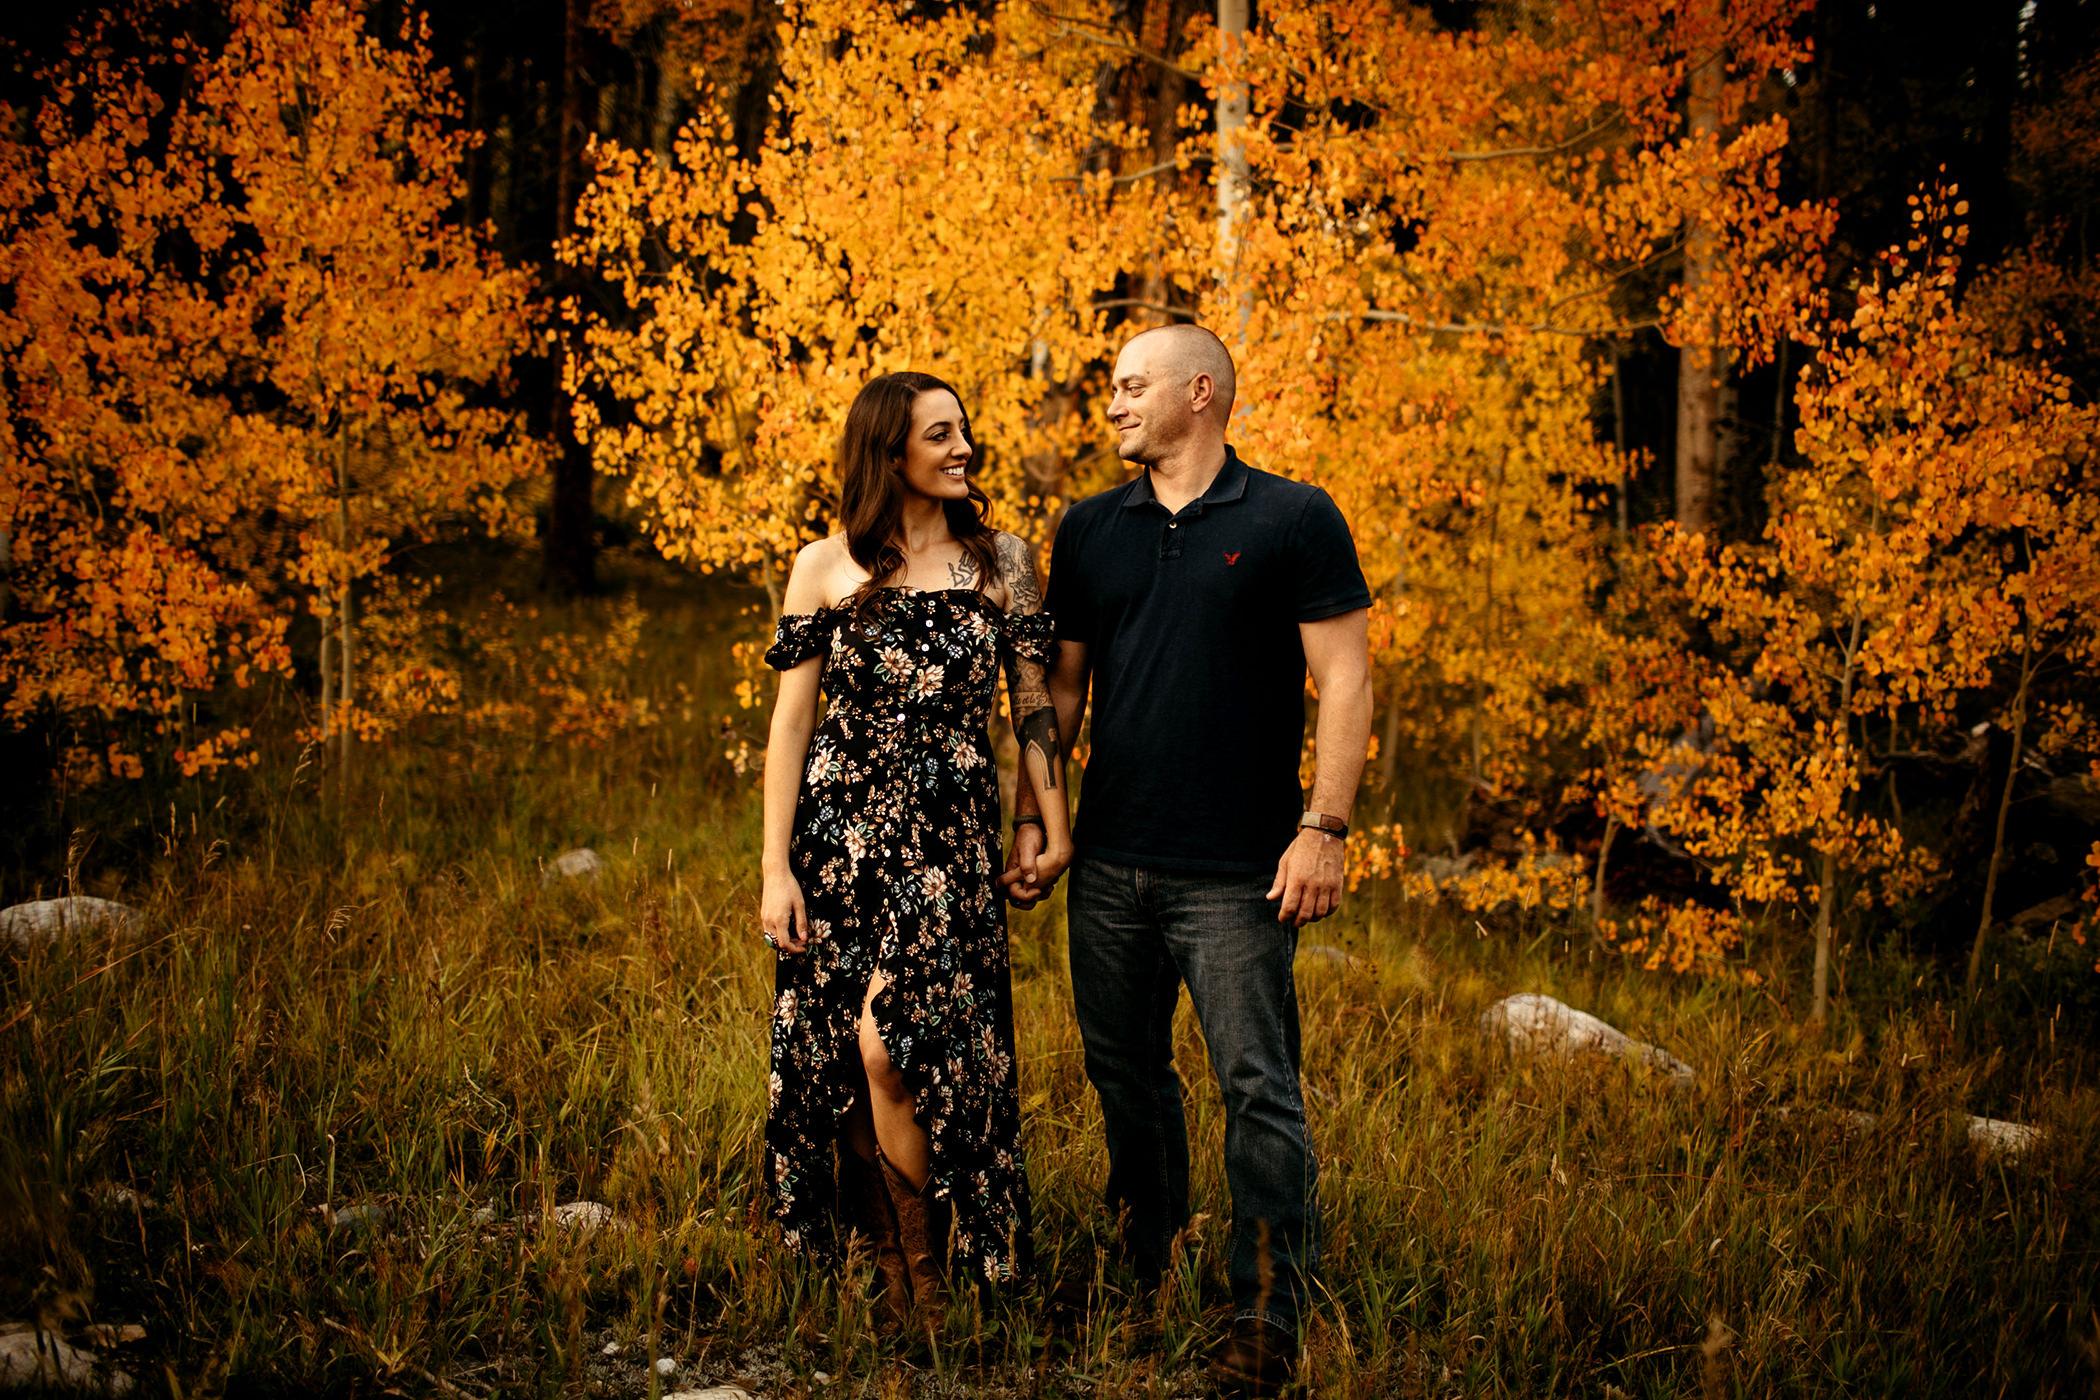 liz osban photography Wyoming engagement wedding love couple snowy range mountains medicine bow peak centennial WY cheyenne Laramie elopement adventure elope prairie